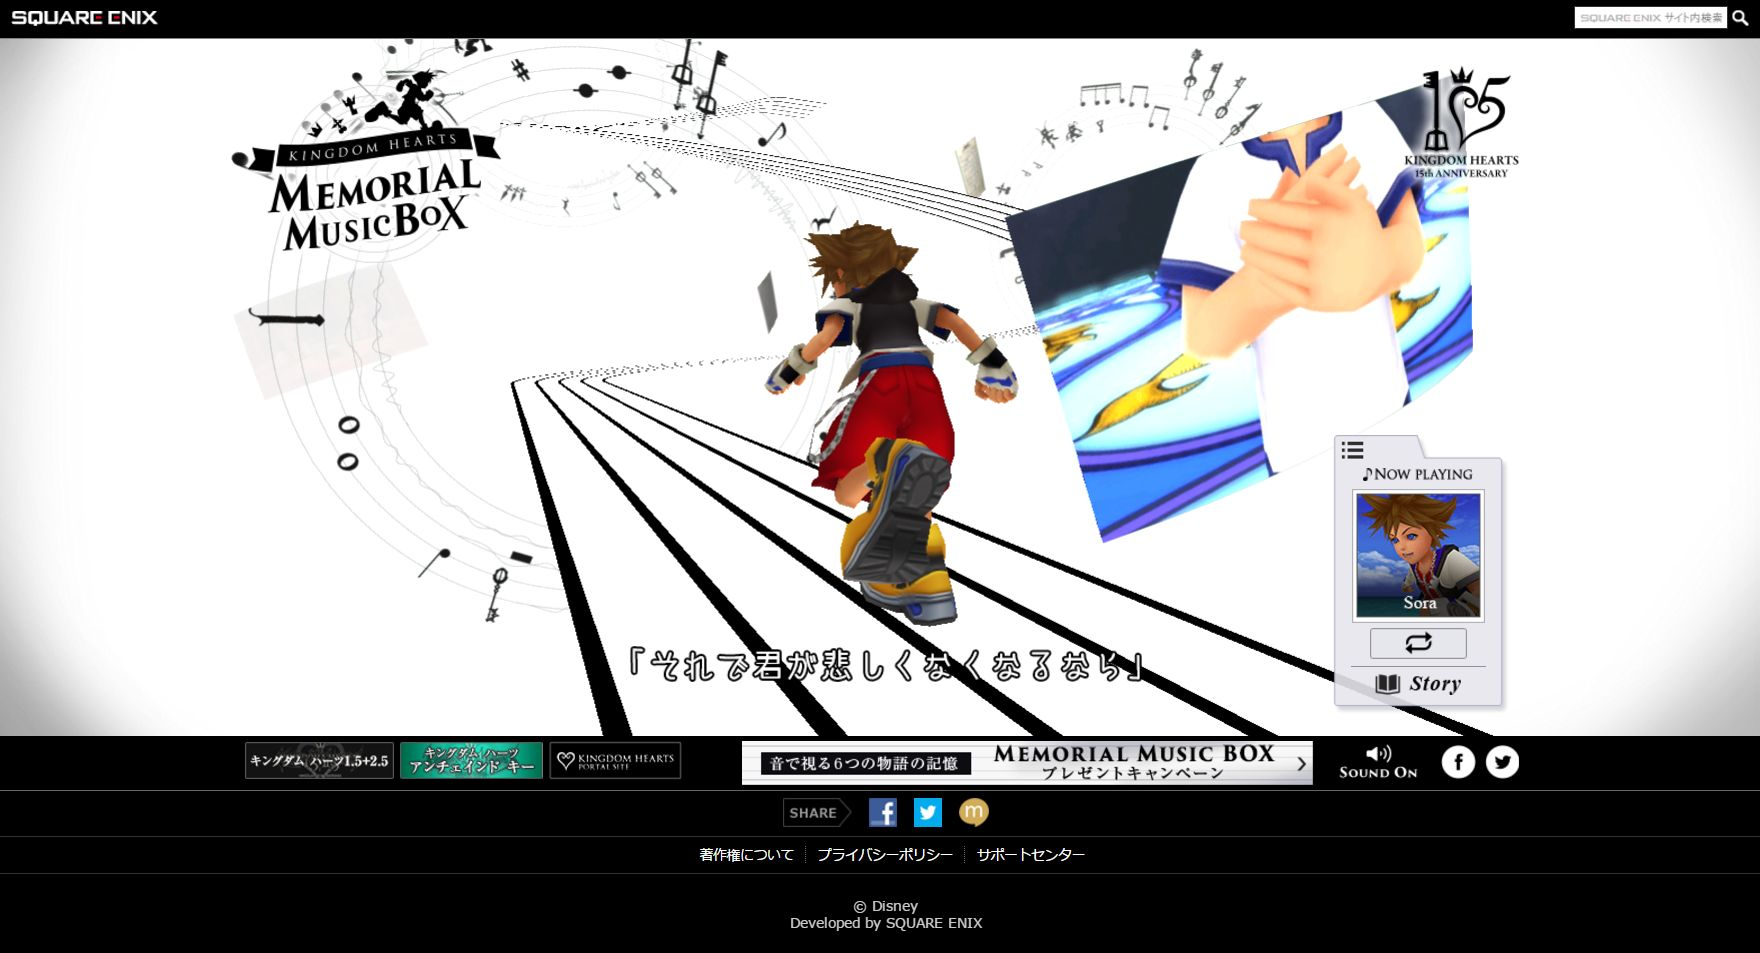 kh-memorial-musicbox_170309 (3)